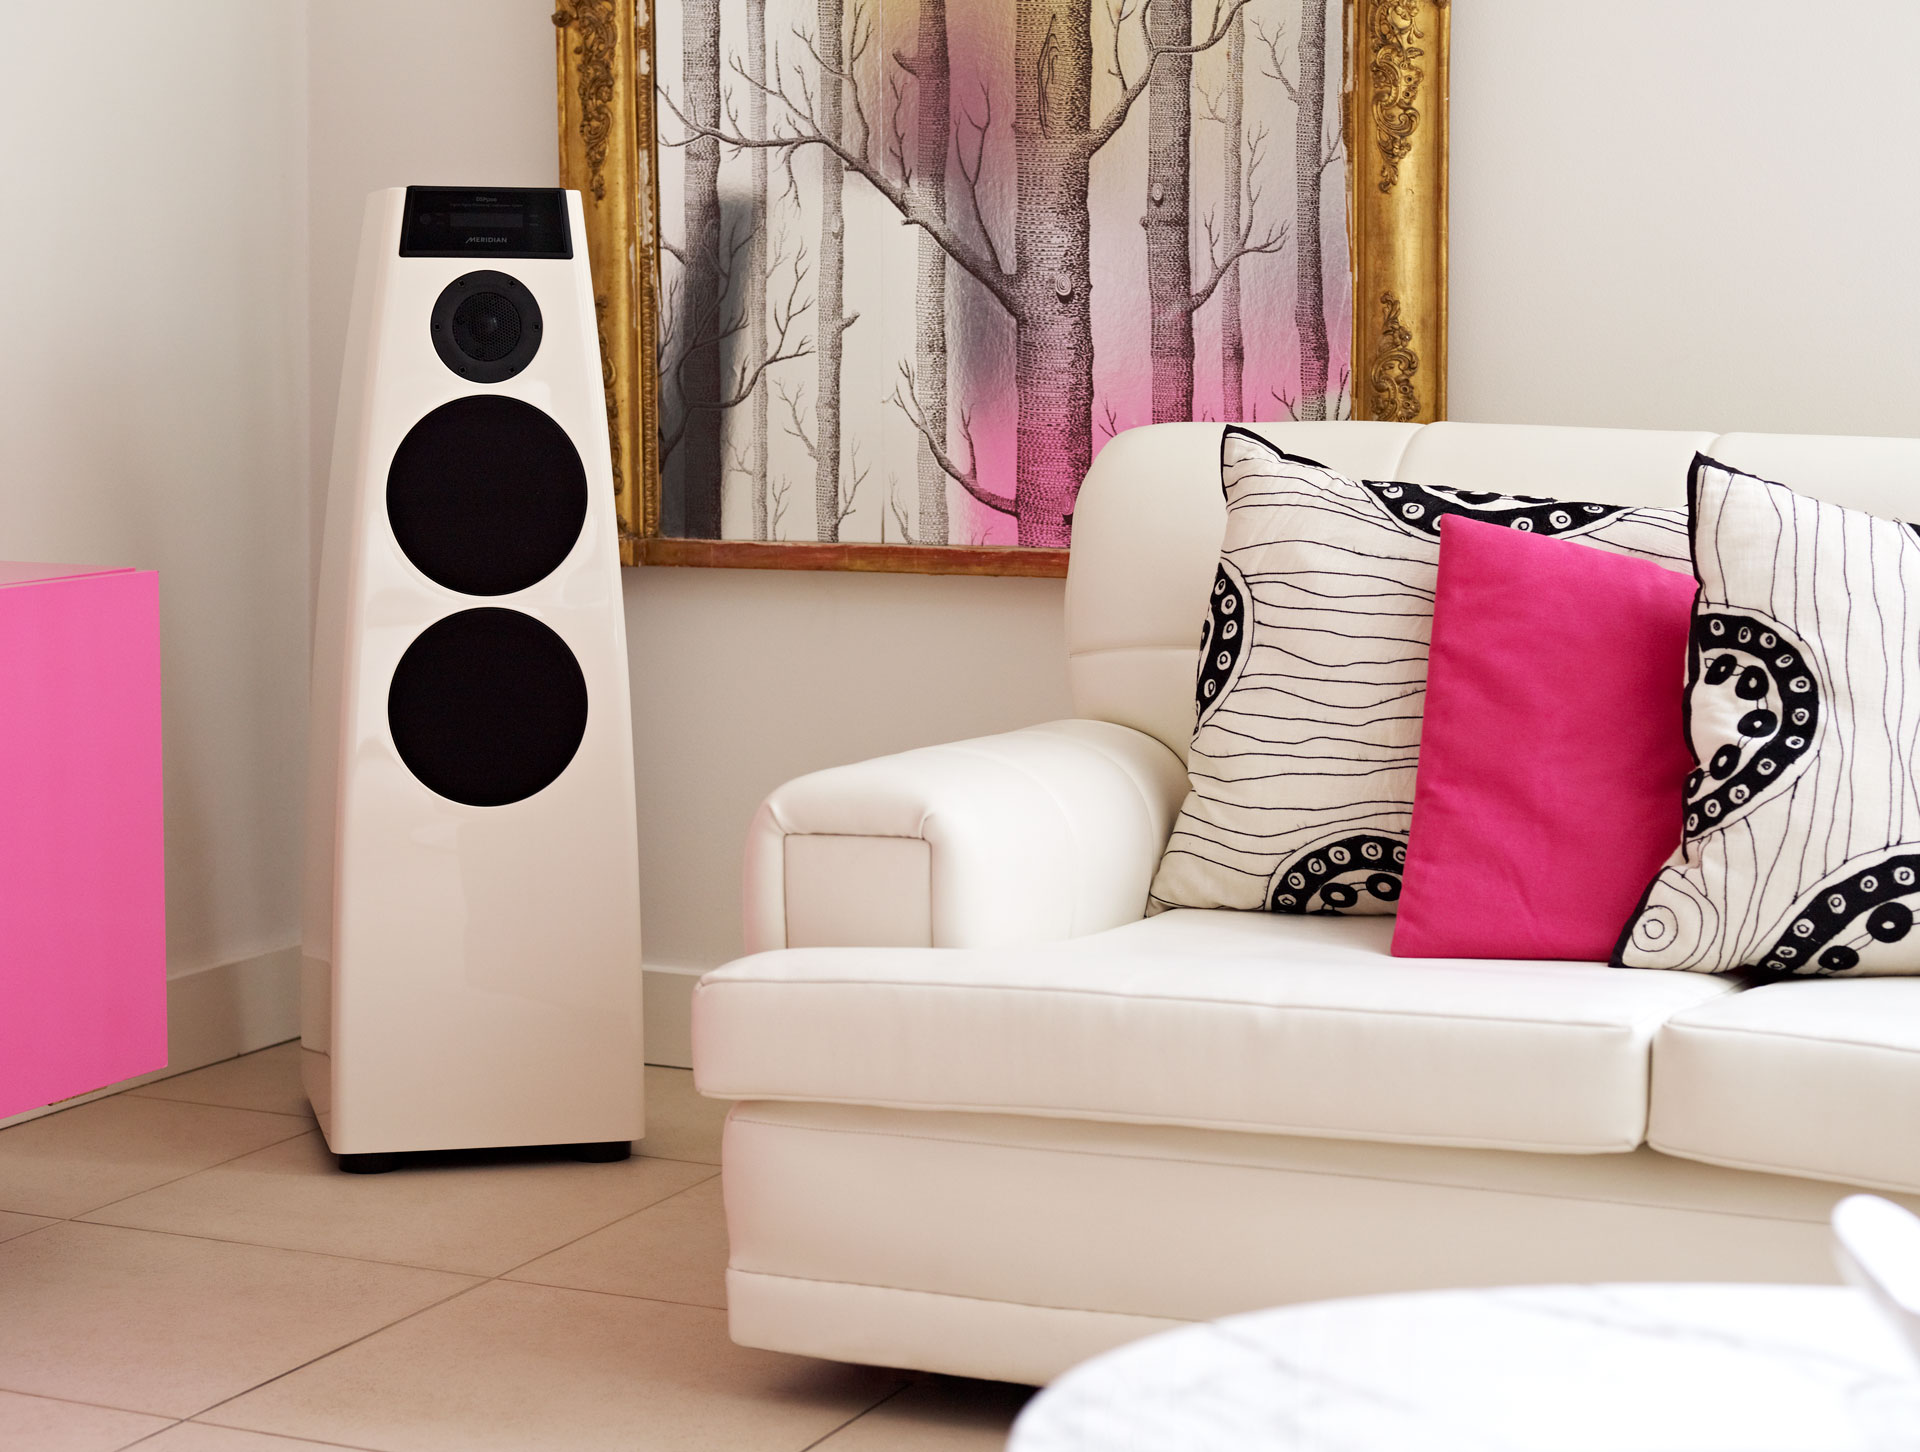 Audio consumer electronics lifestyle product photography by UK photographer Del Manning